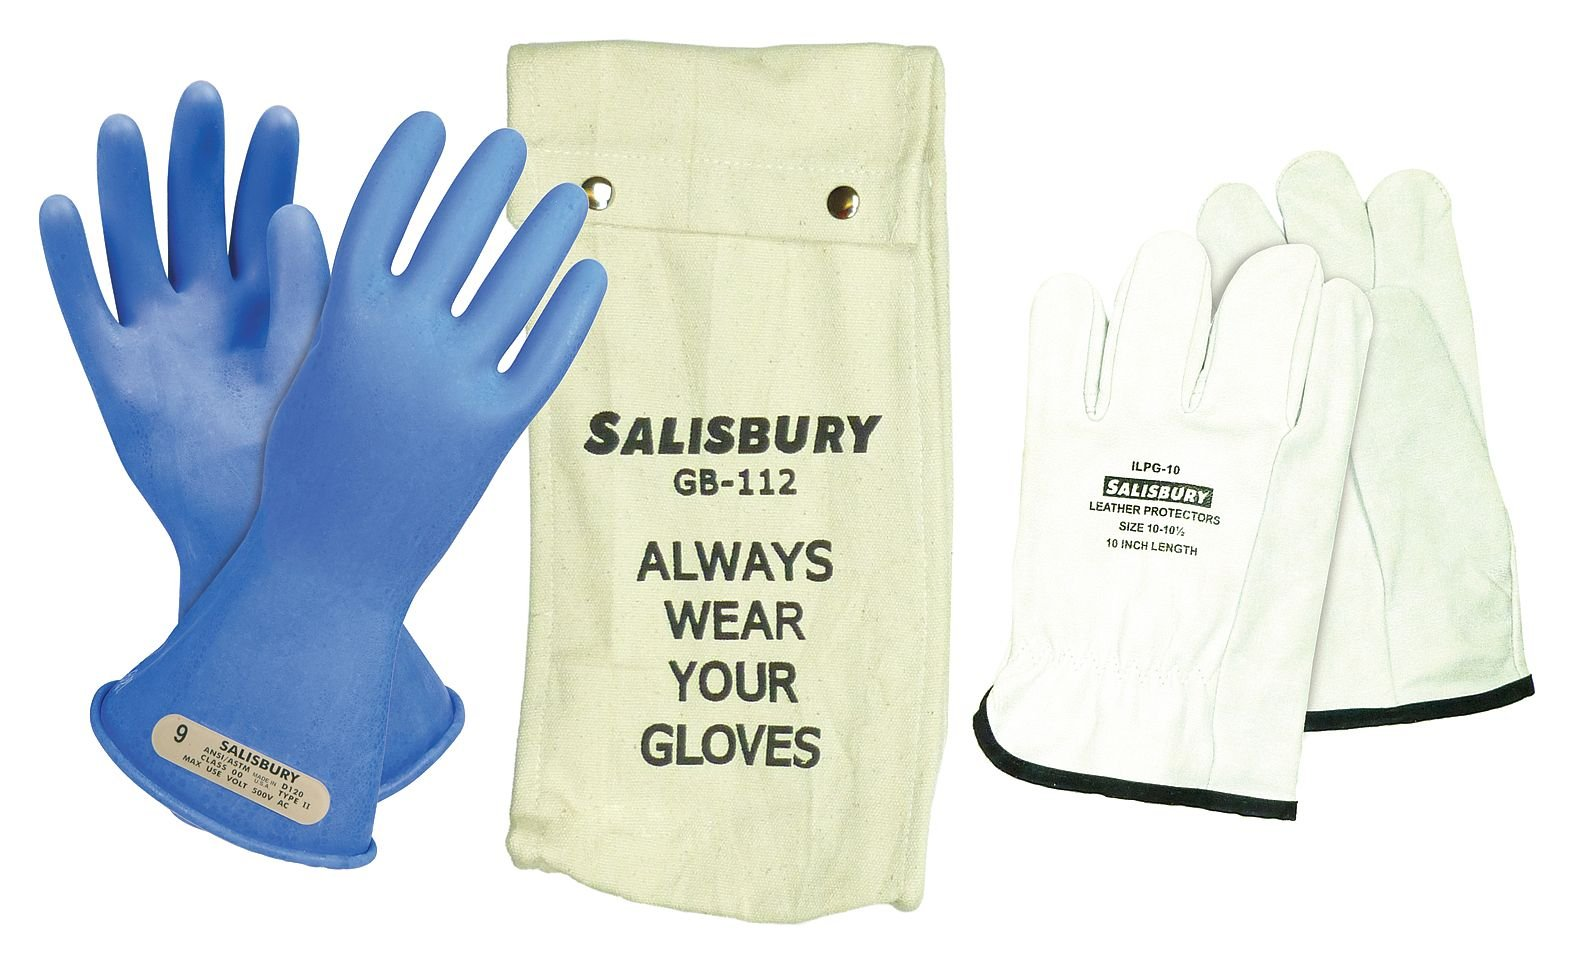 Salisbury Blue Electrical Glove Kit, Rubber, 00 Class, Size 11 11 Blue Rubber GK0011BL/11 - 1 Each